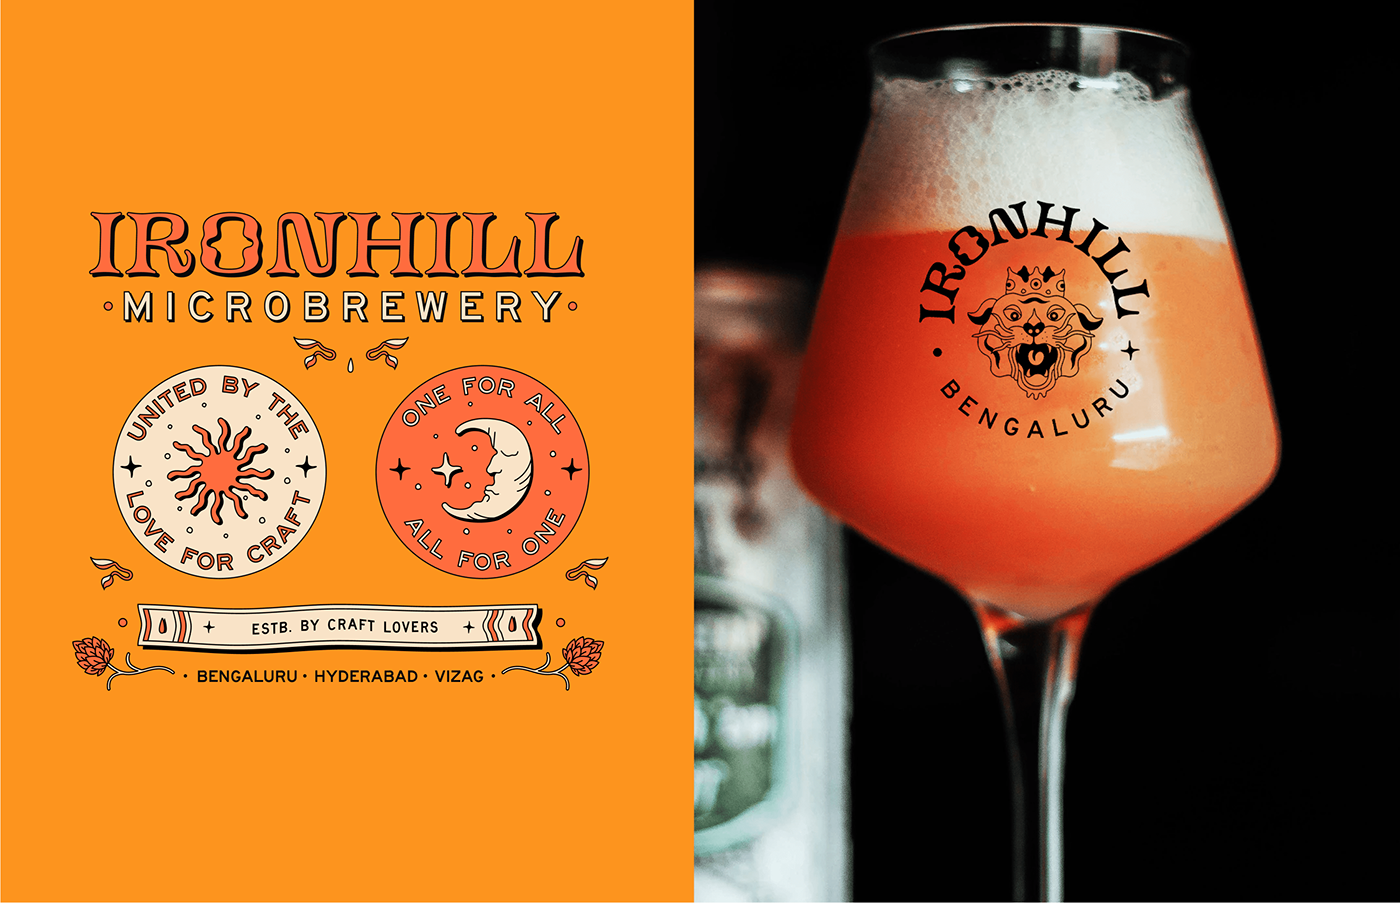 beer branding  brewery fantasy Identity Design ILLUSTRATION  logo Logo Design Microbrewery visual identity